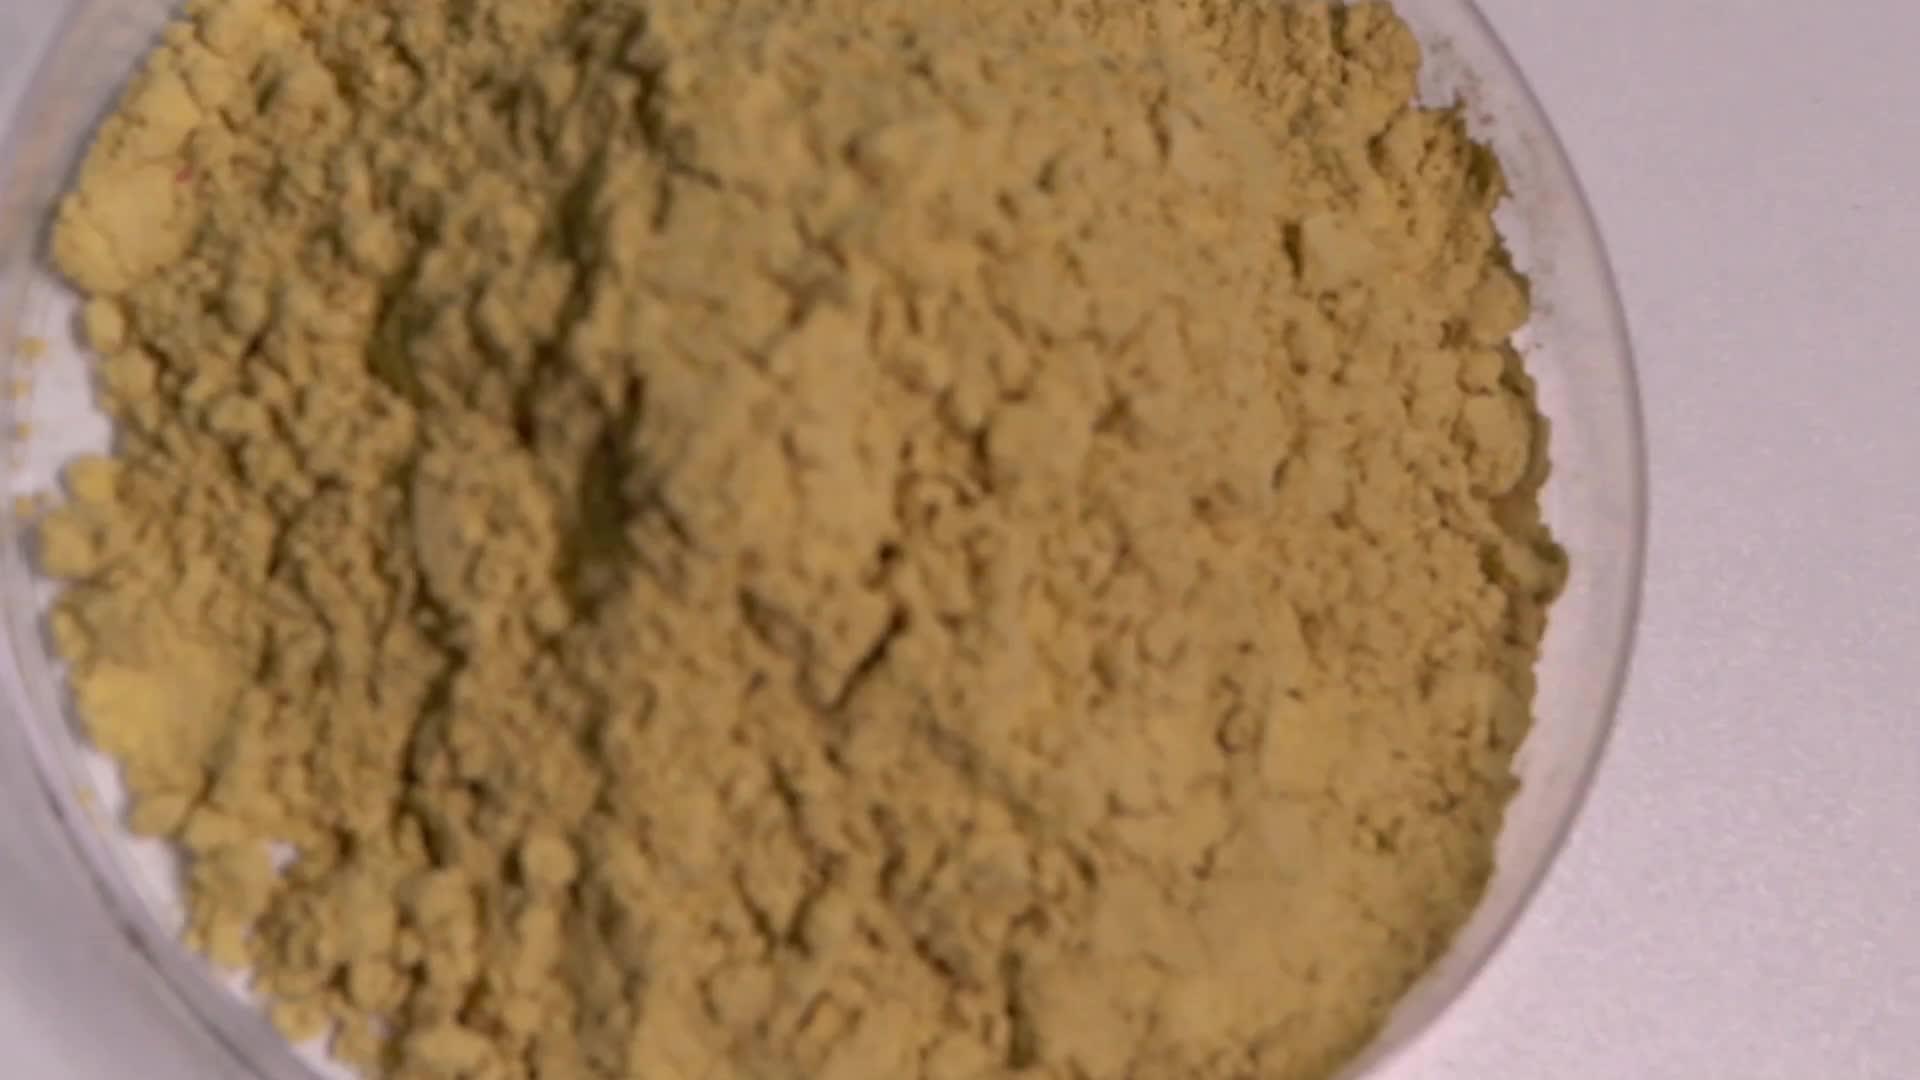 HONGDA Factory Supply  Organic Reishi Mushroom Extract Powder Lucidum Ganoderma Reishi Mushroom Powder Ganoderma